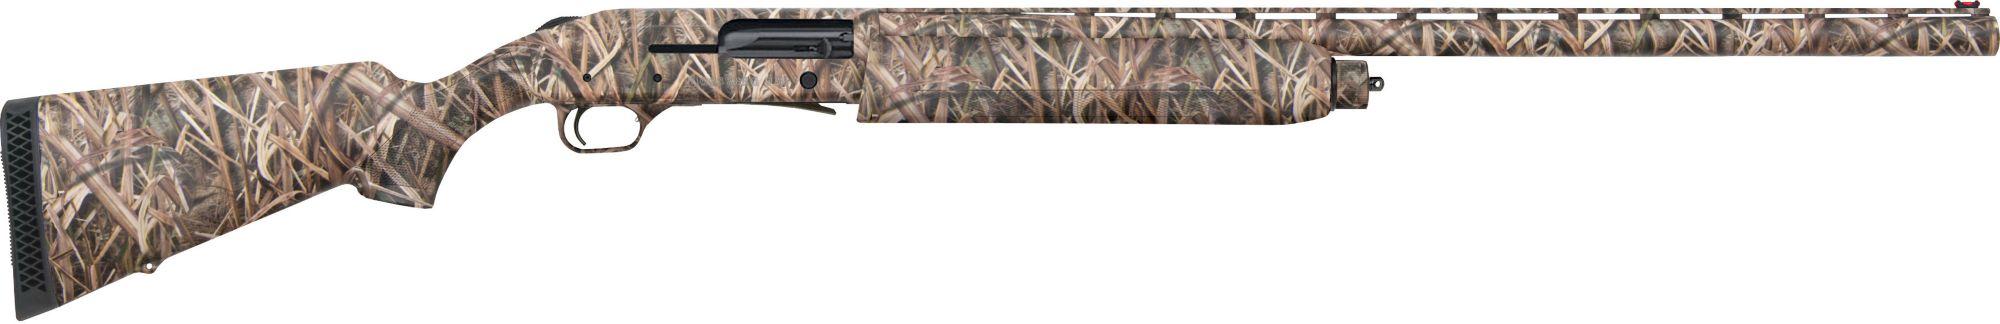 Choosing the Right Shotgun for Bird Hunting - Hinterland